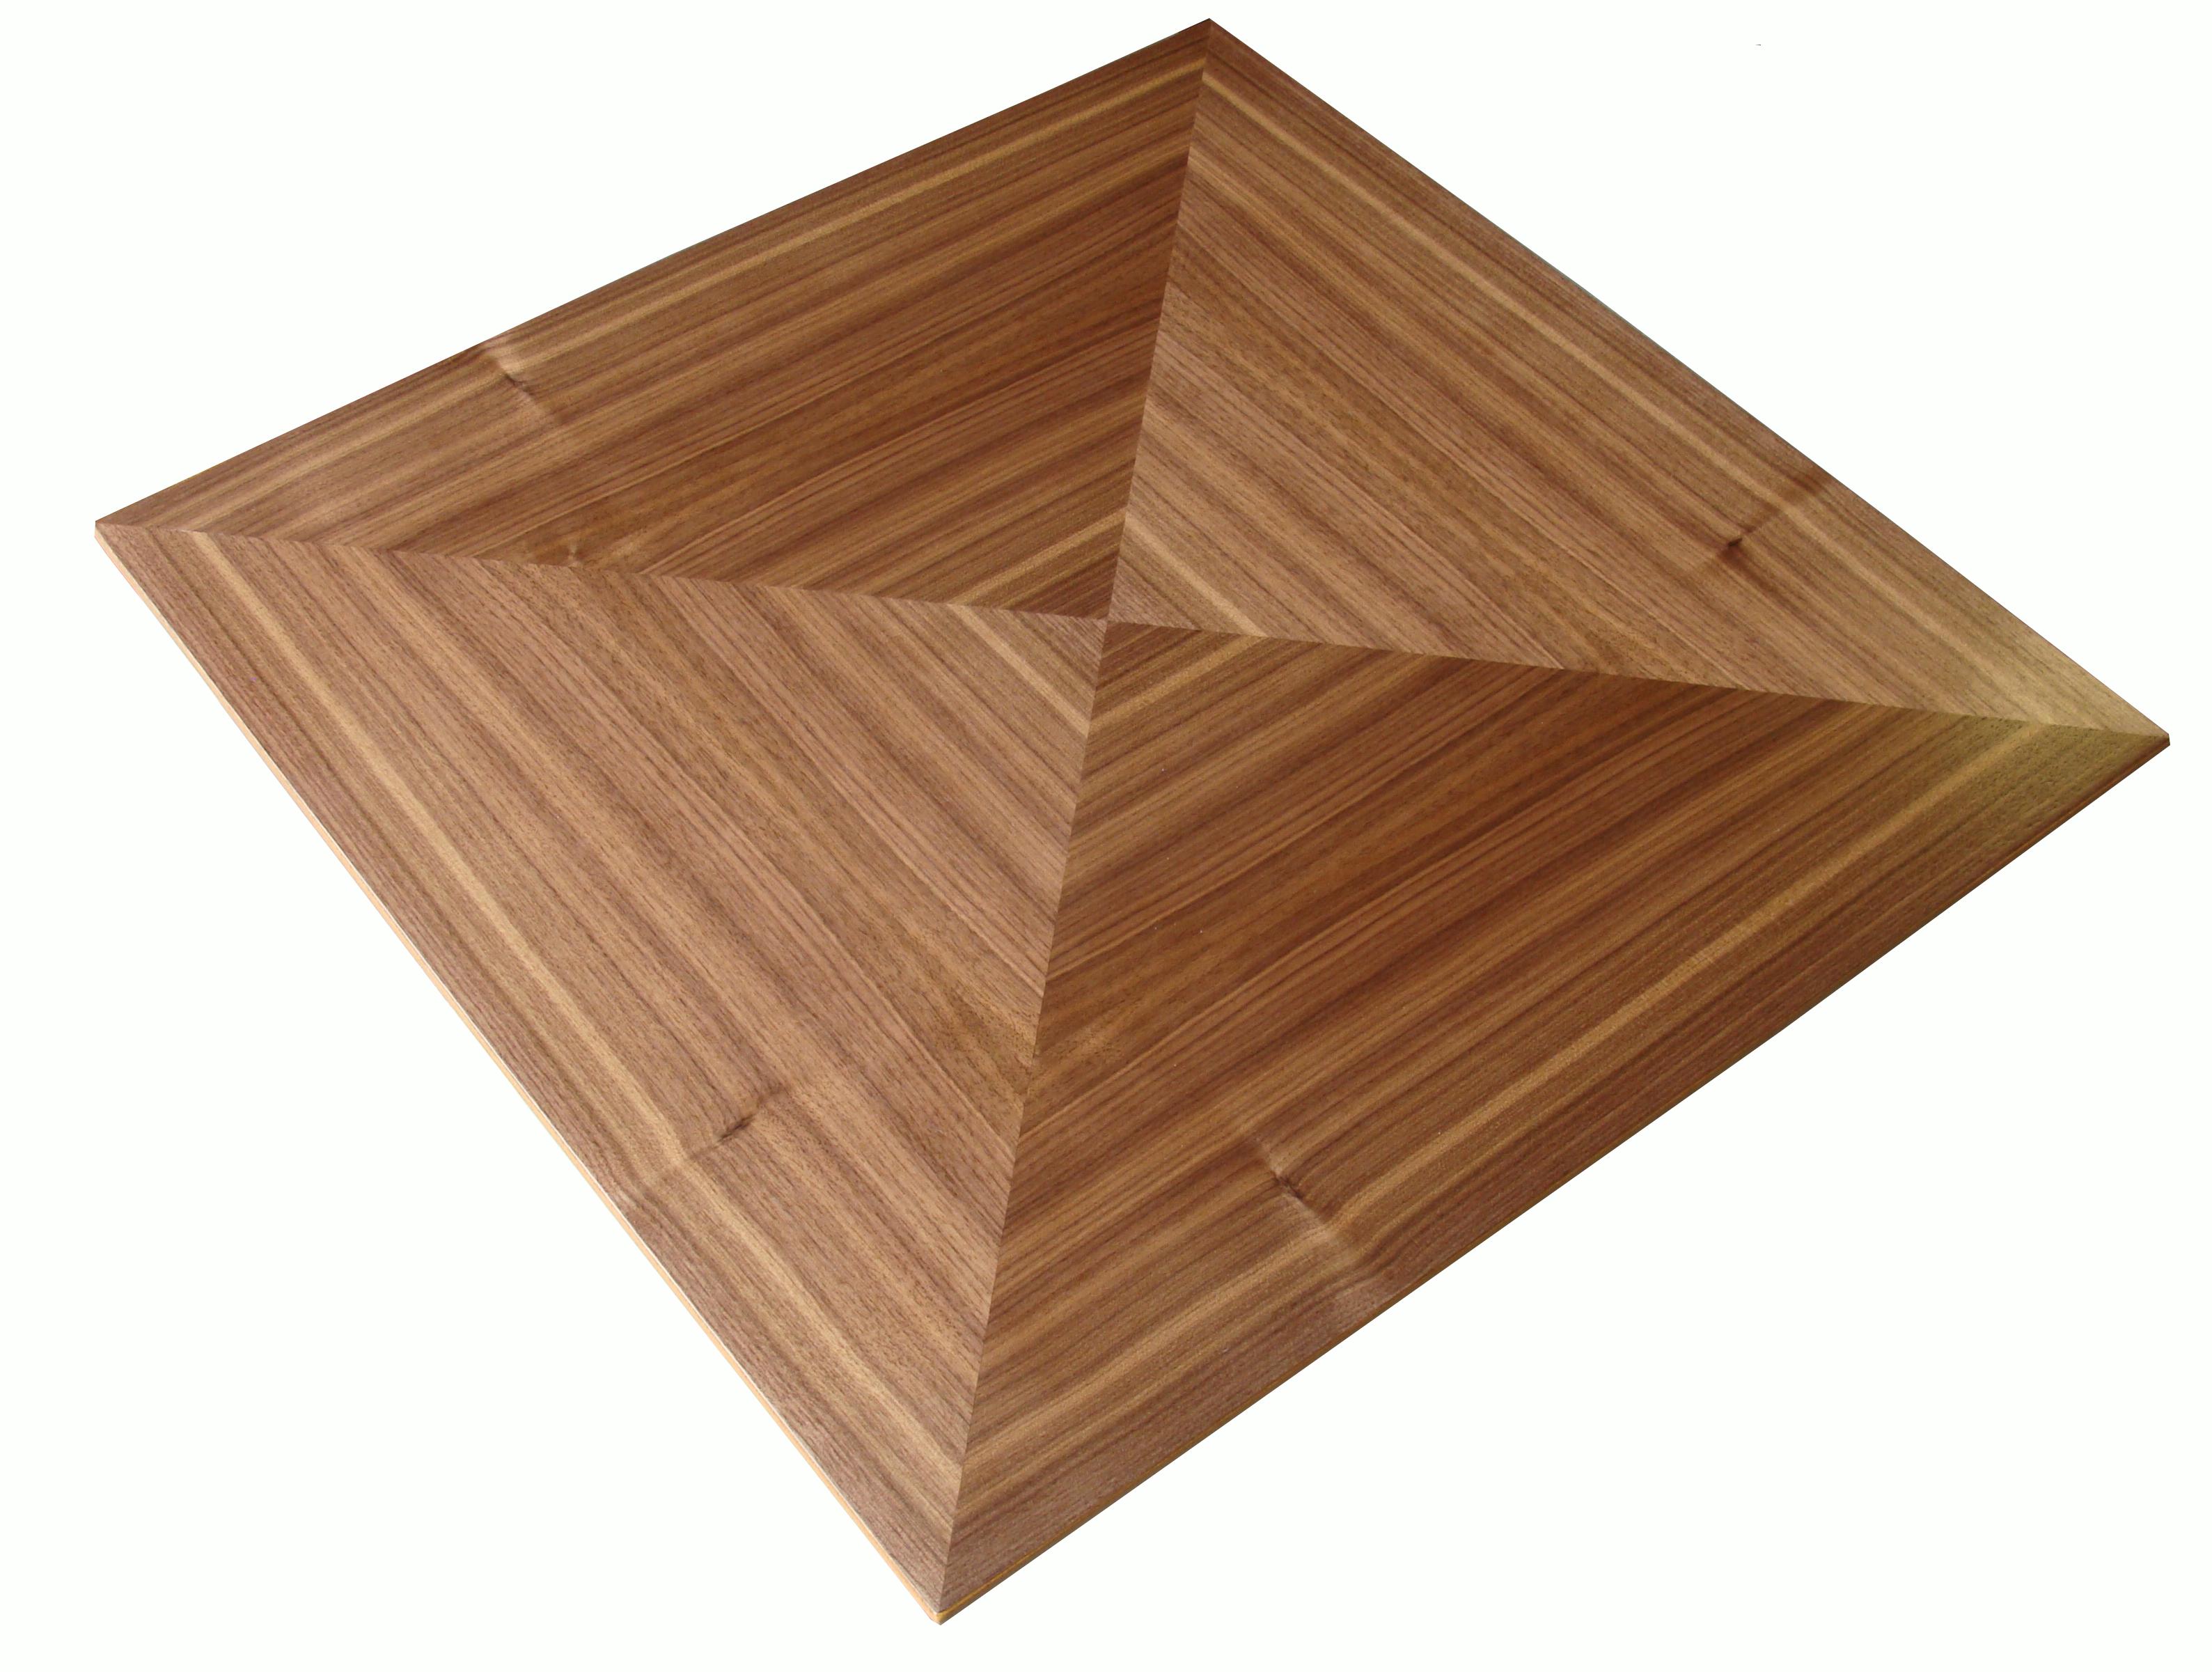 wooden-table-tops-veneer-angles.png